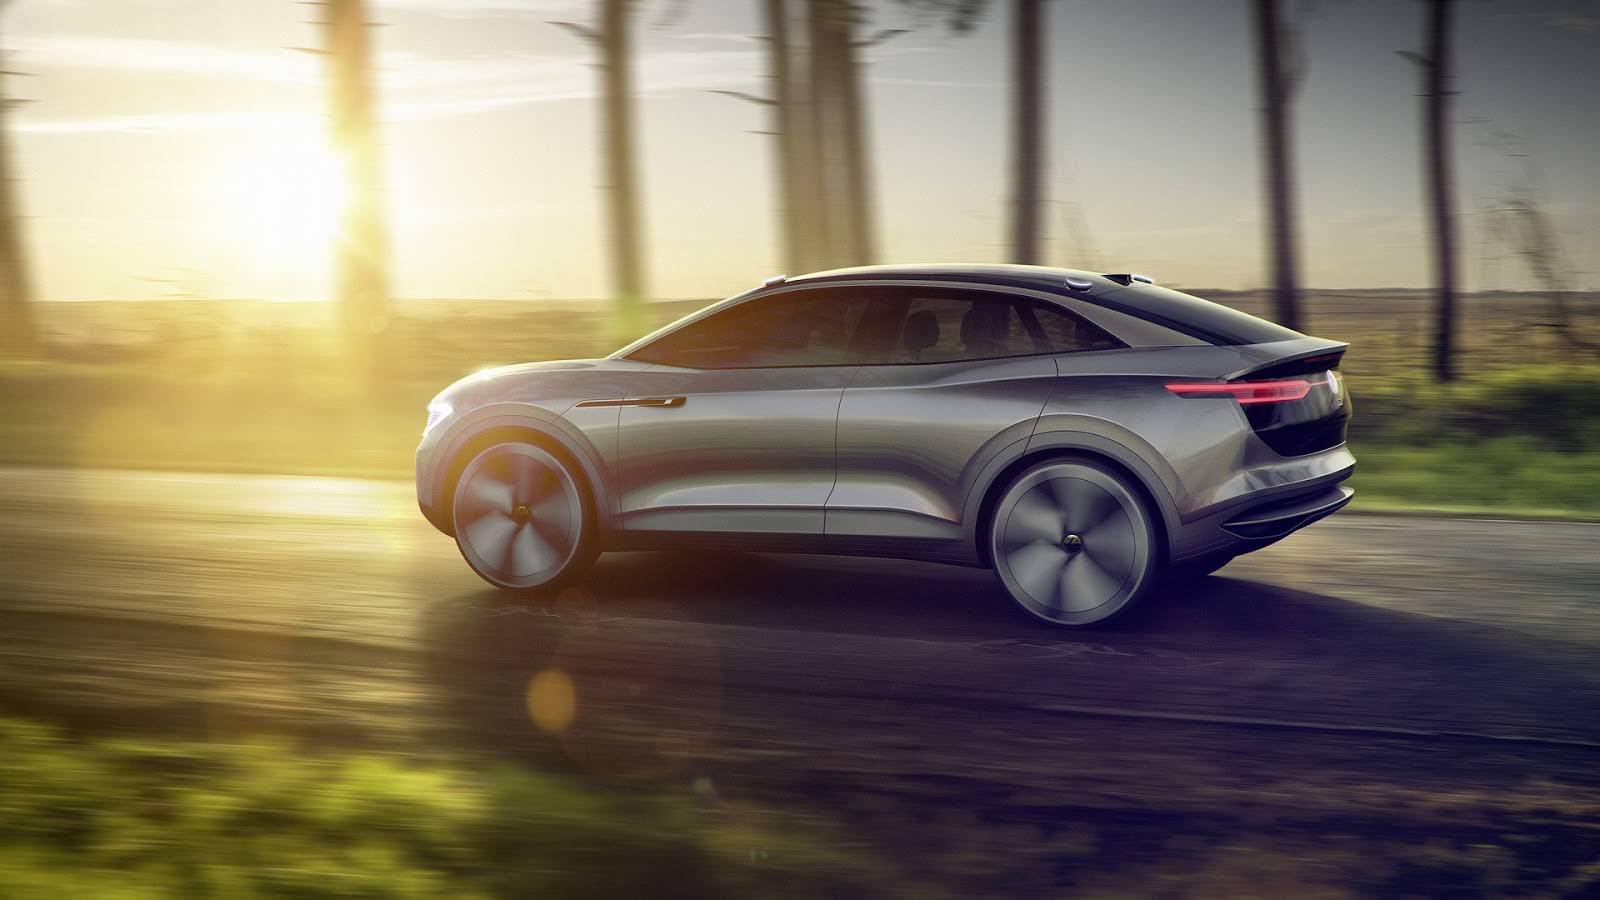 Кроссовер с автопилотом Volkswagen I.D. Crozz Concept 2017